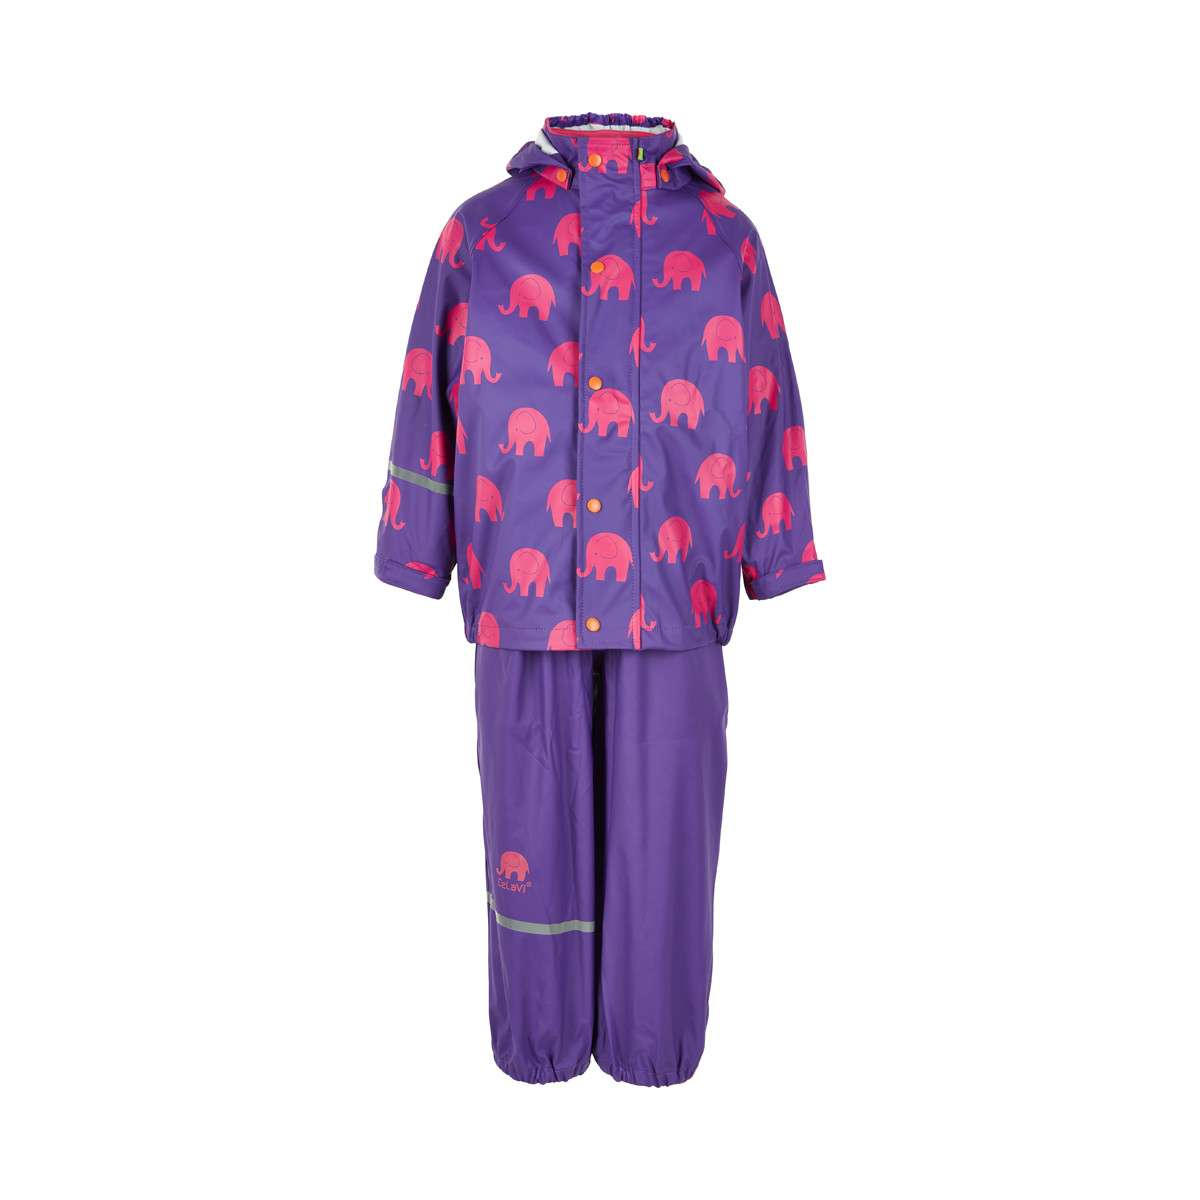 Celavi Unisex Suit W Elephant Print Raincoat